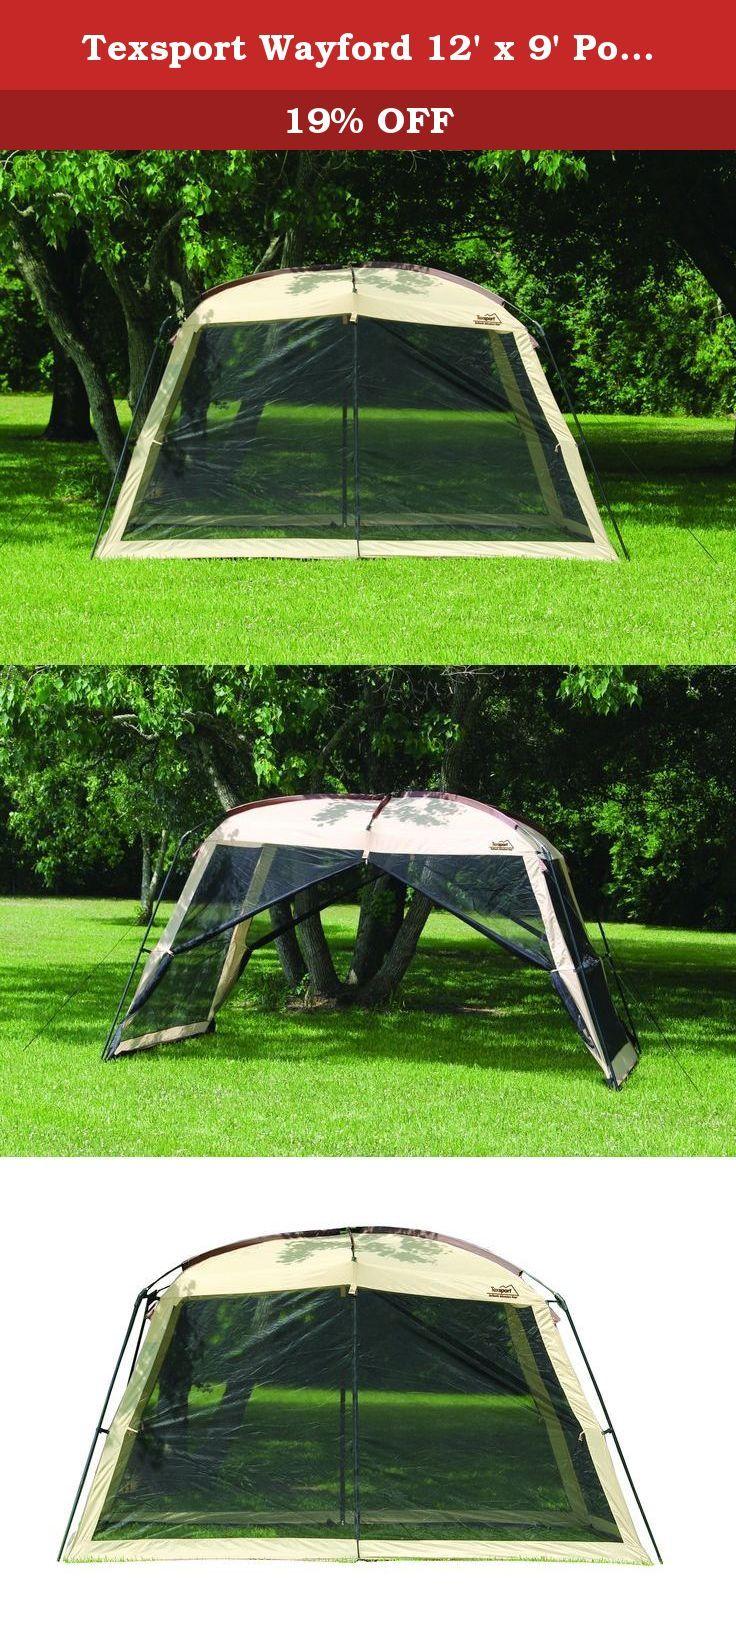 Texsport Wayford 12u0027 X 9u0027 Portable Mesh Screenhouse Arbor Canopy For  Backyard And Camping